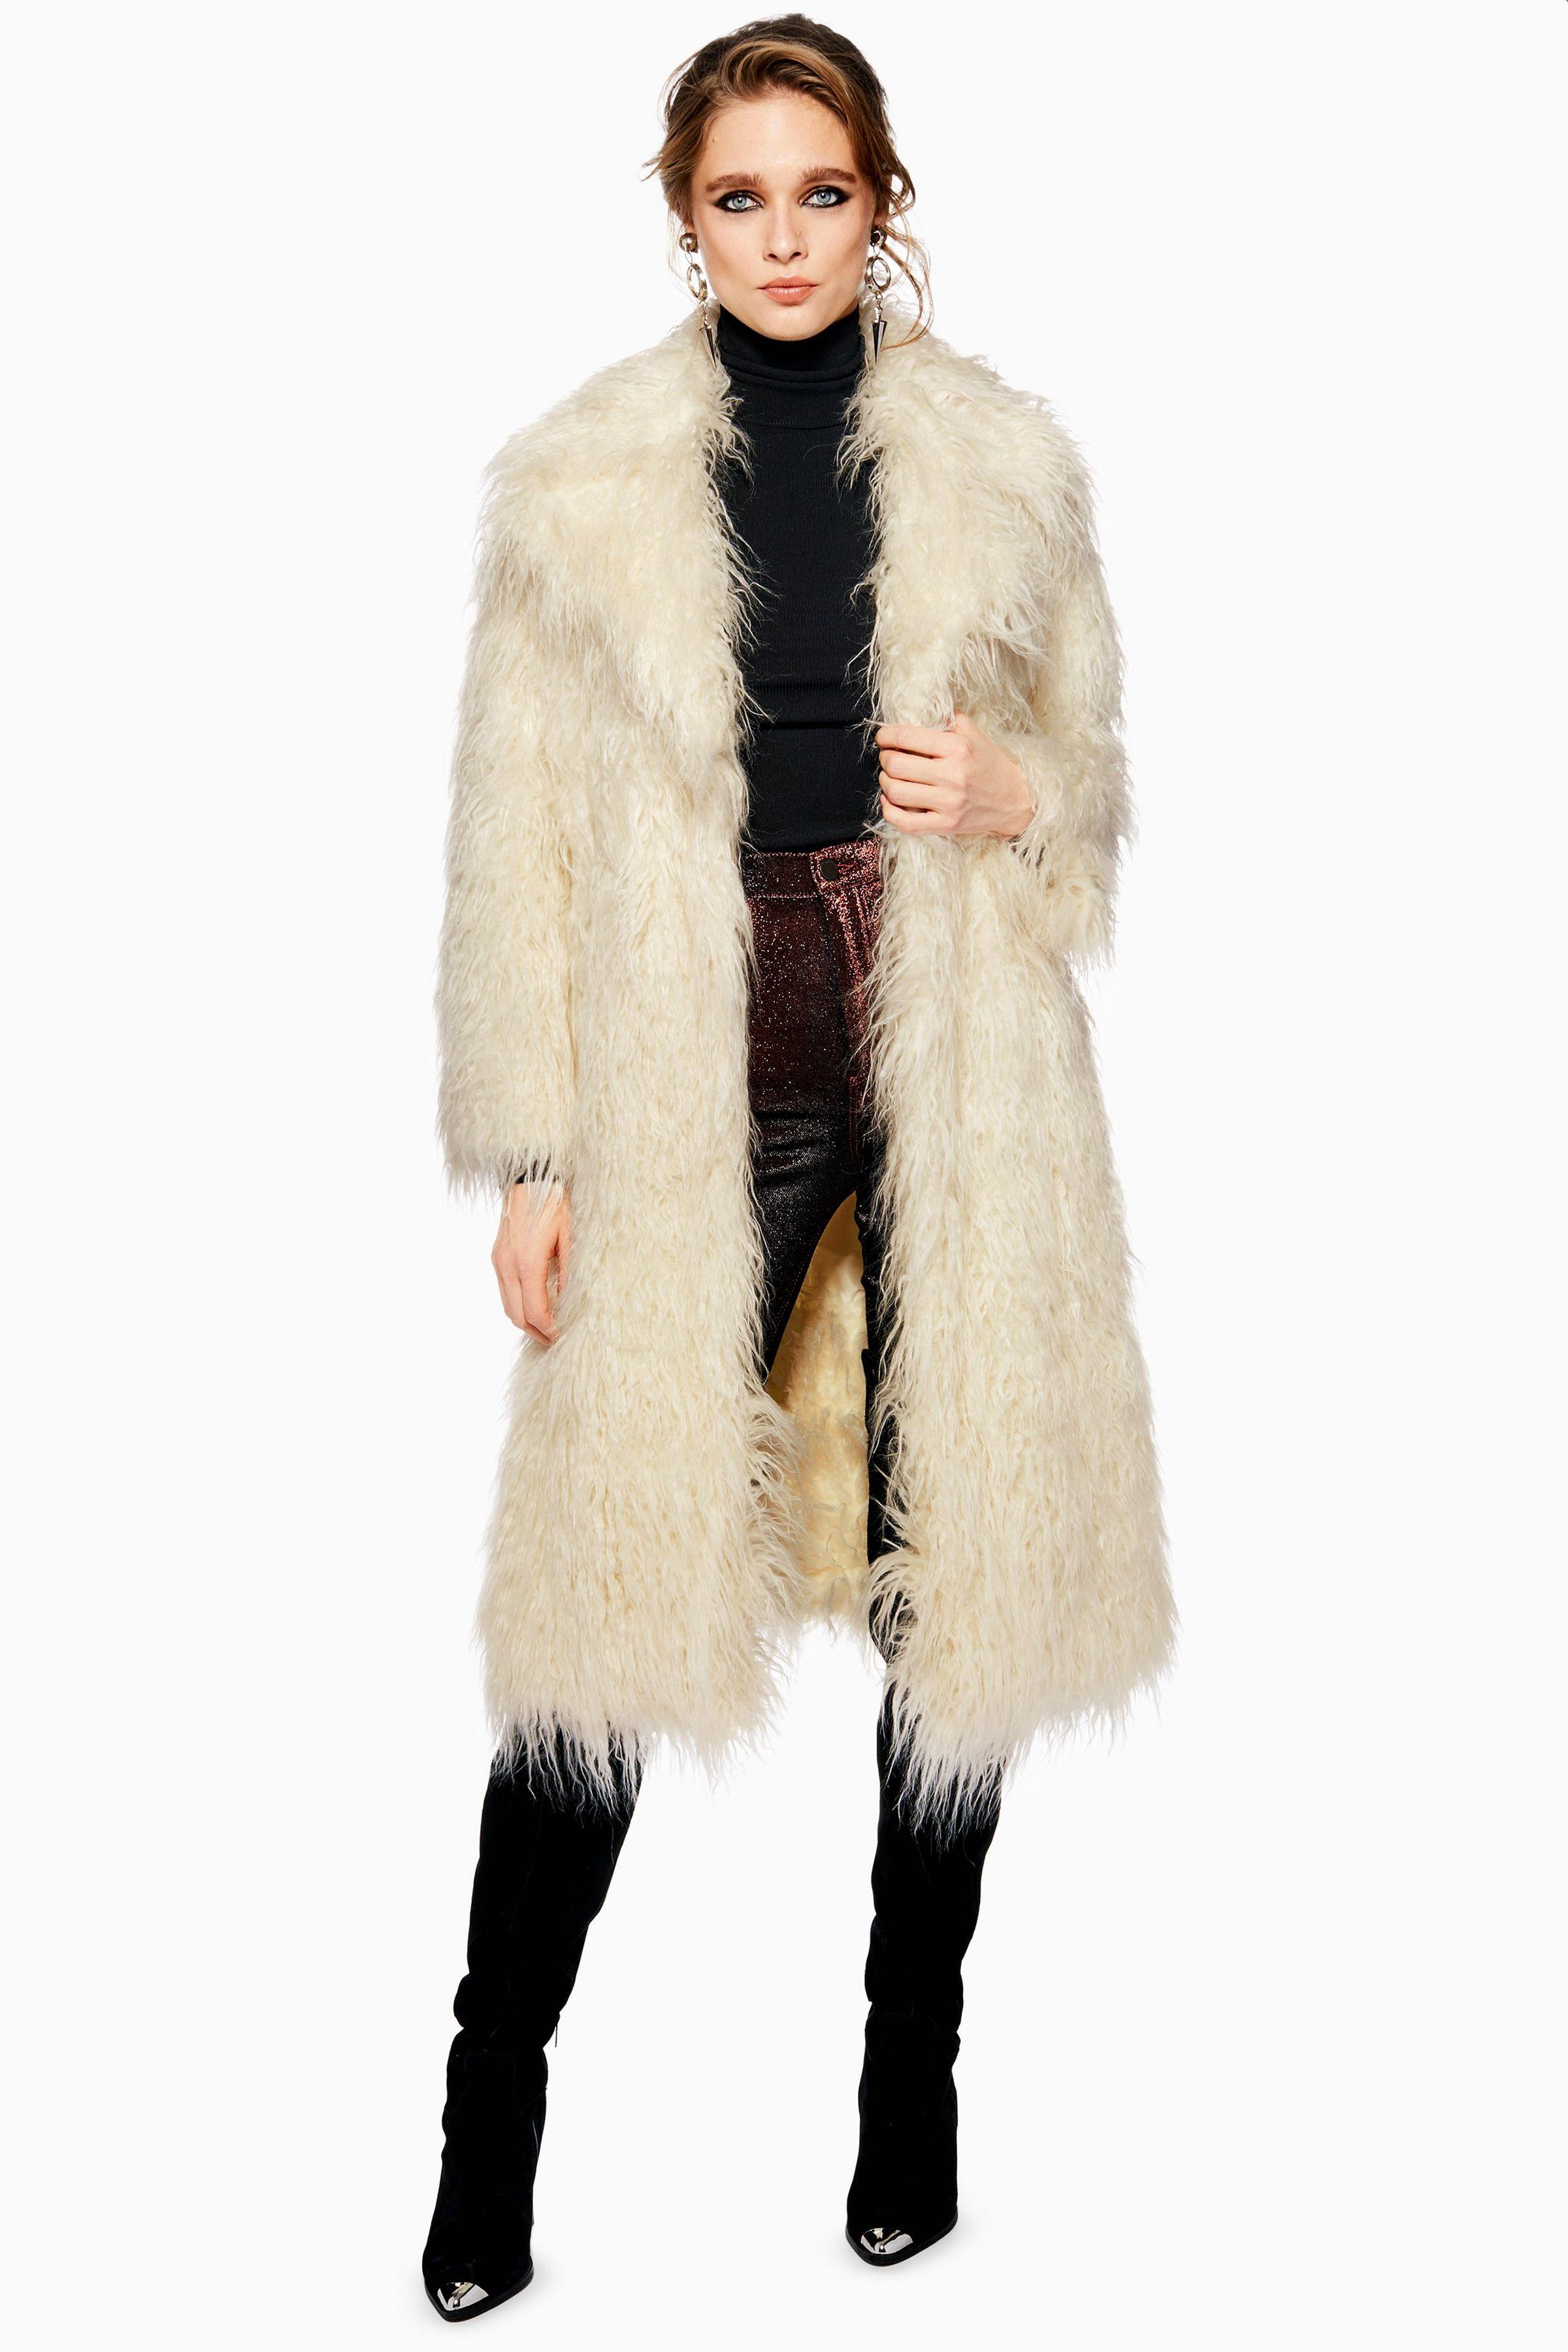 Topshop White Fur Coat.jpg